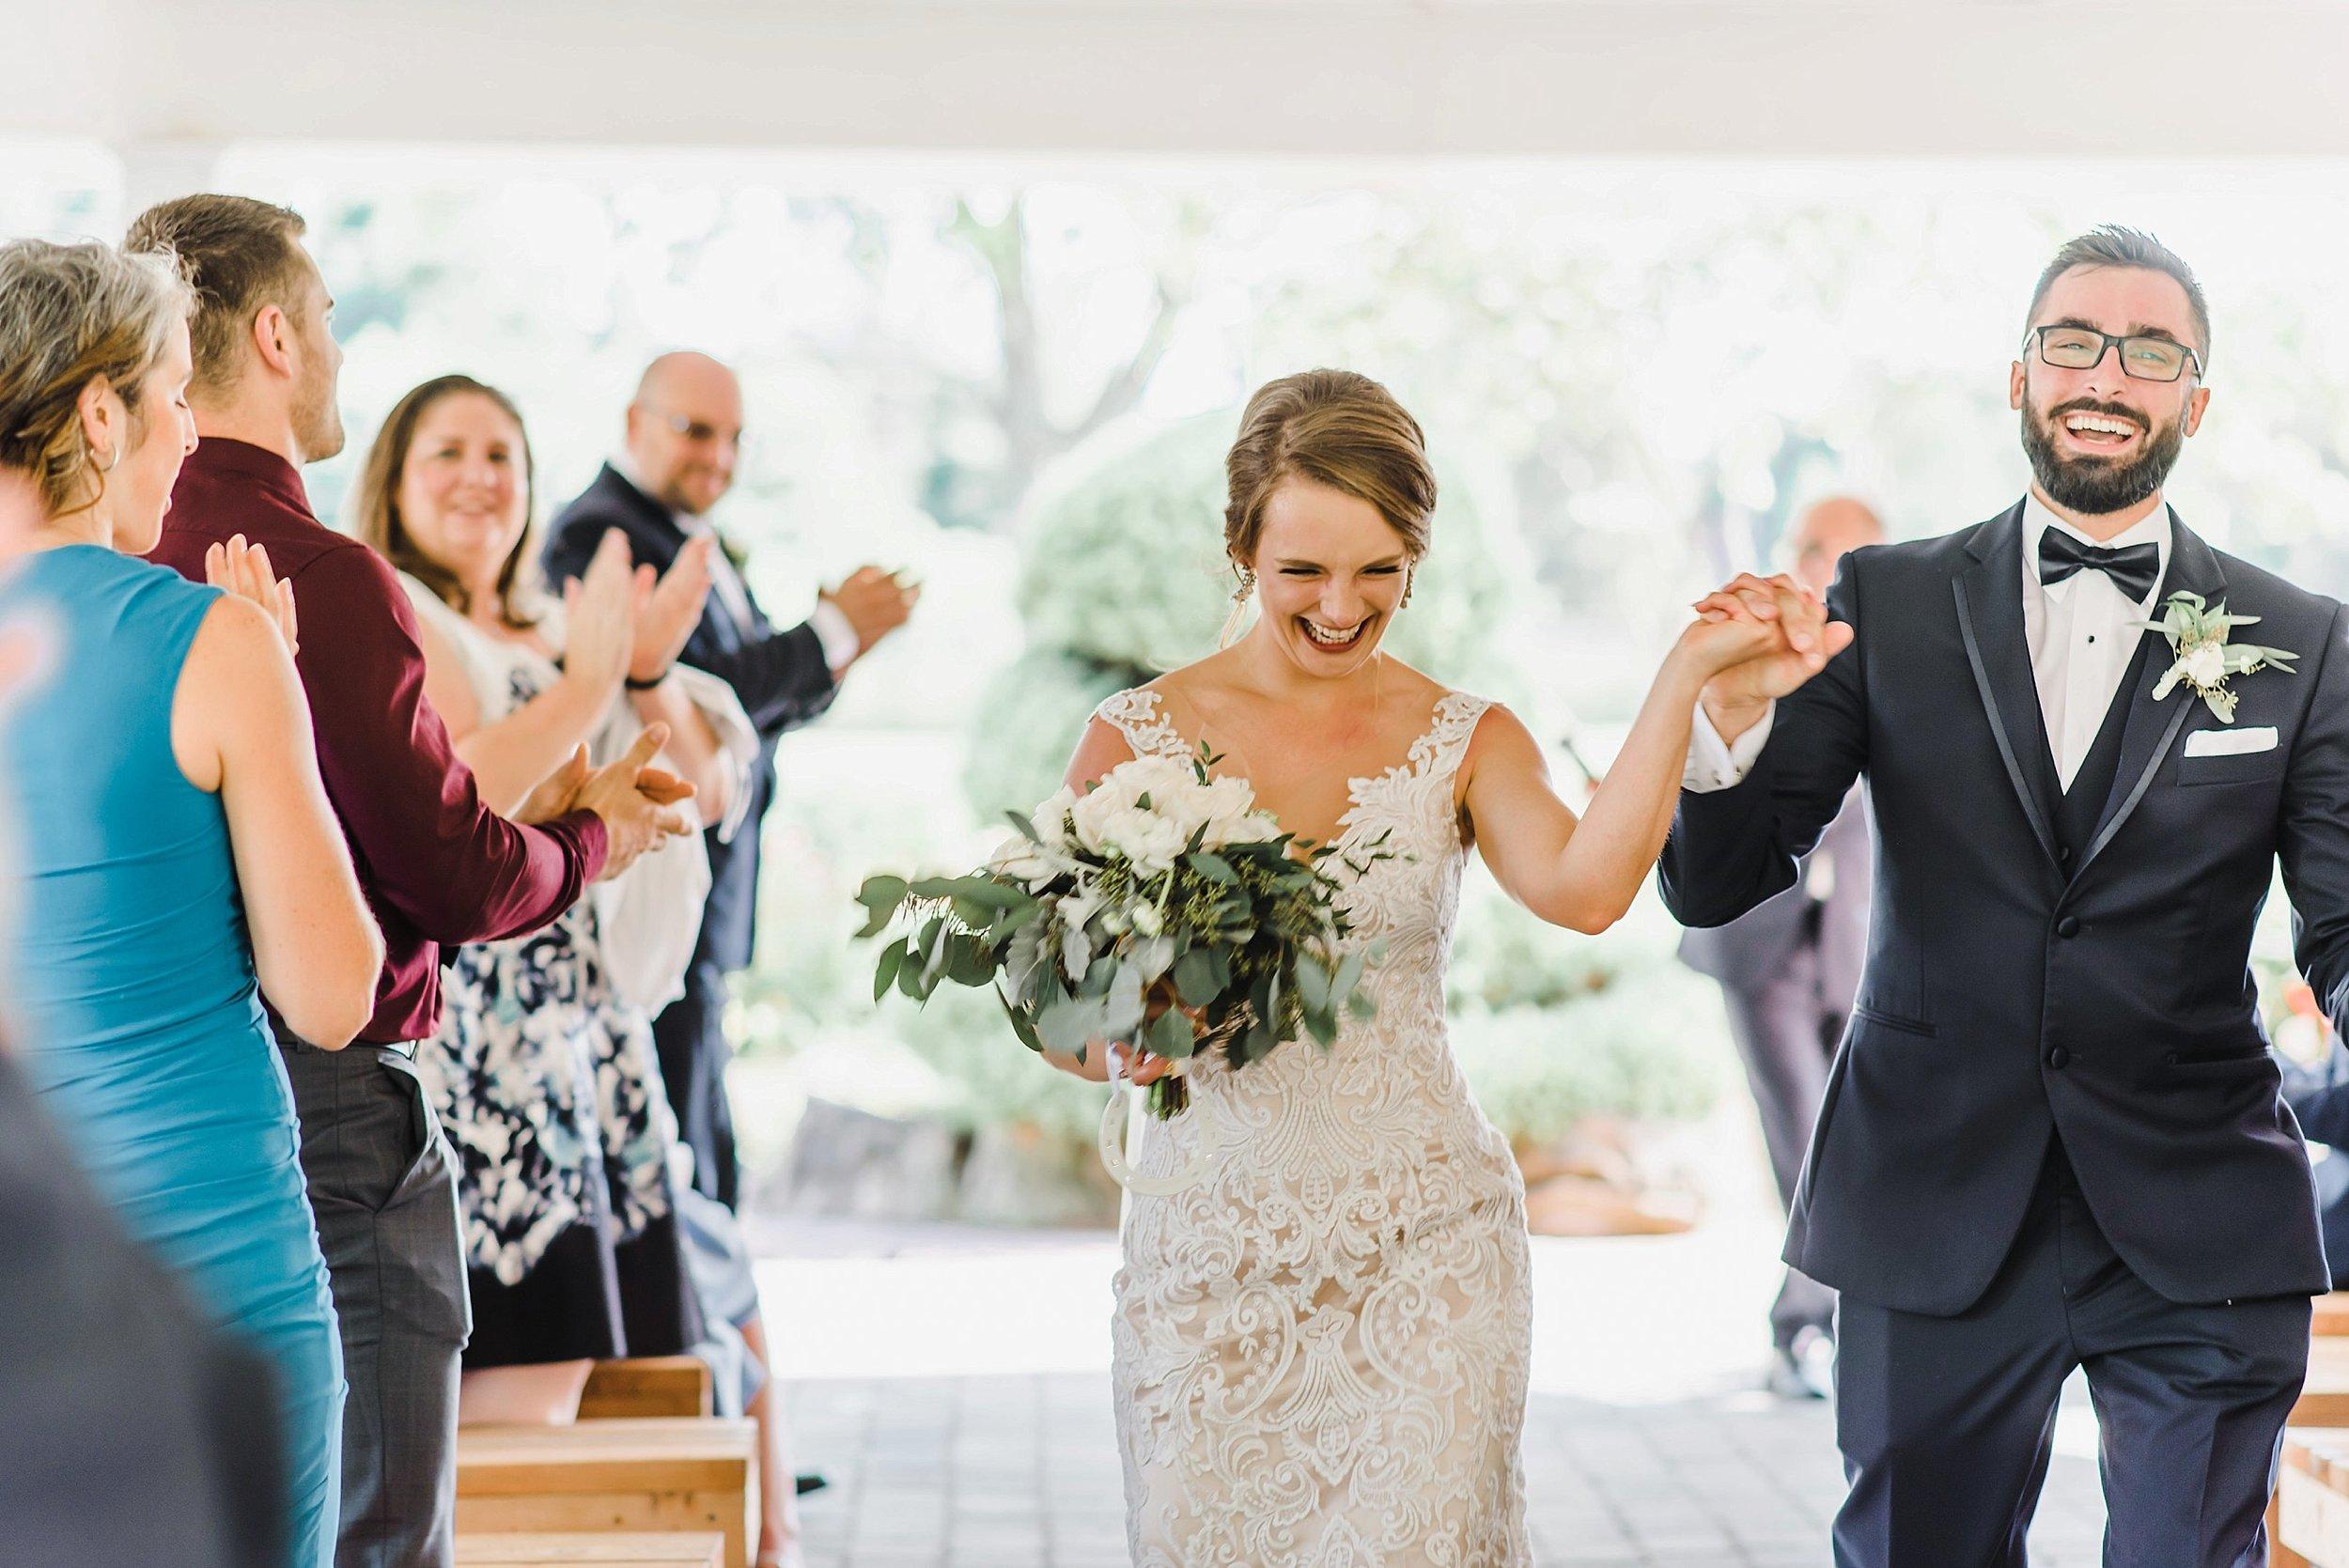 light airy indie fine art ottawa wedding photographer | Ali and Batoul Photography_1281.jpg